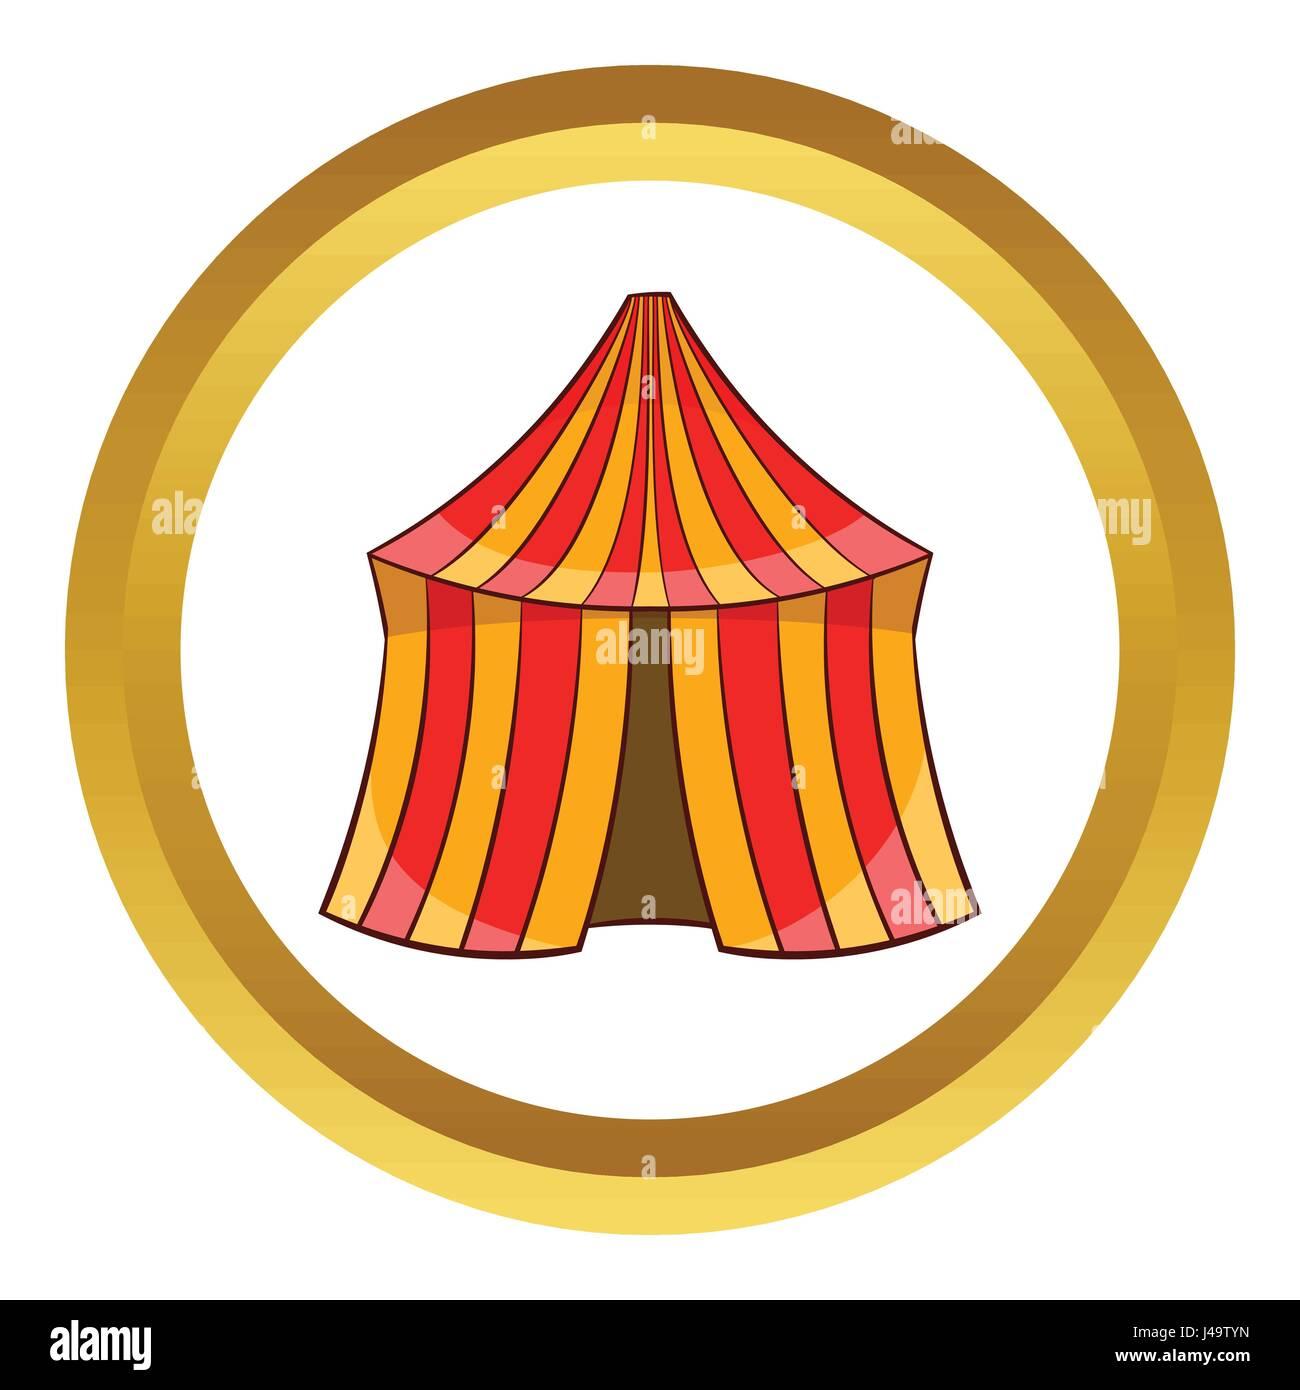 Circus tent vector icon - Stock Image